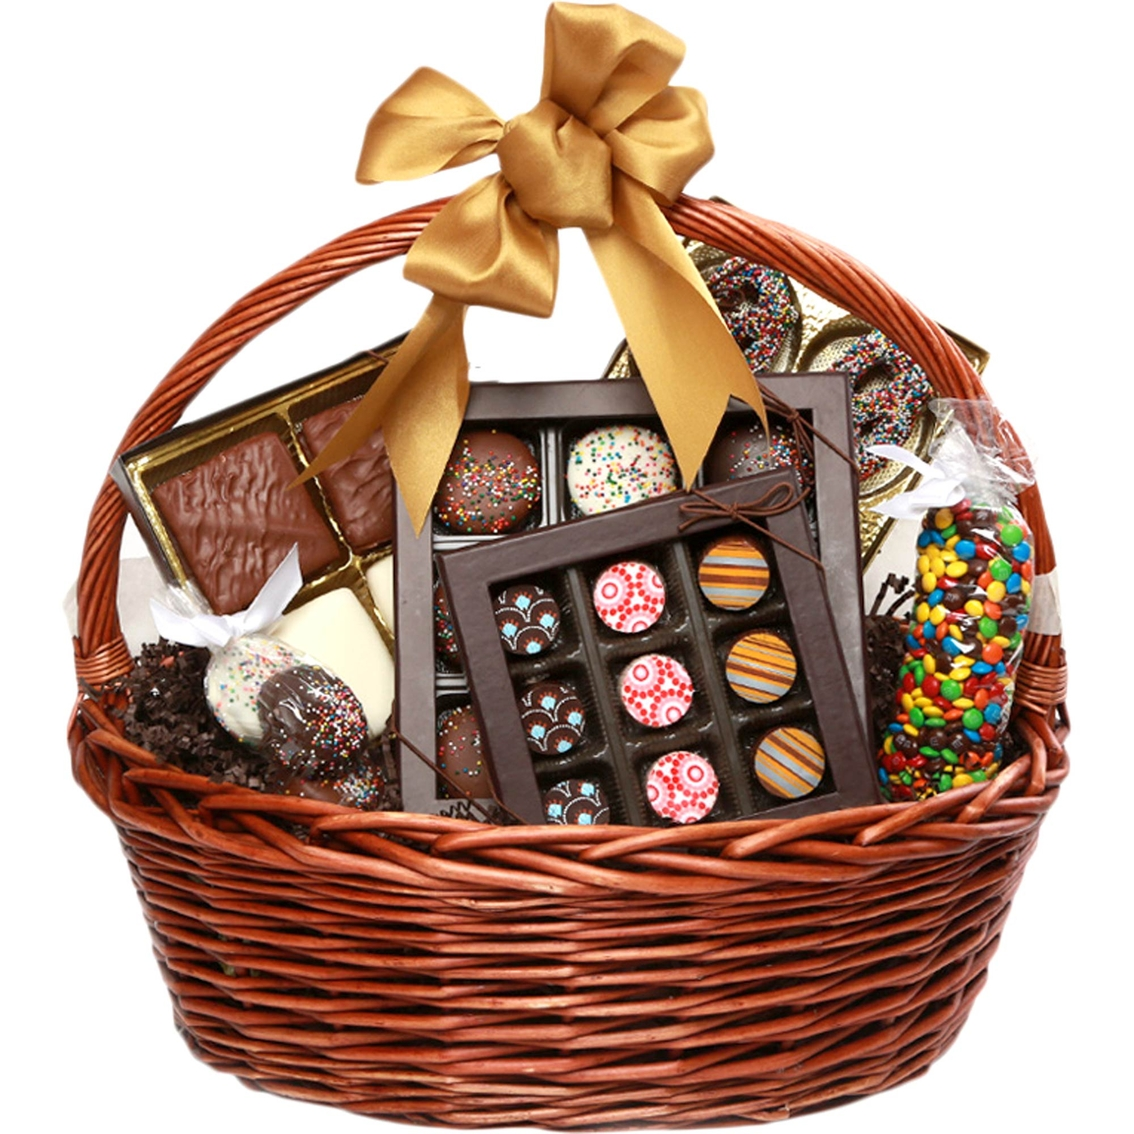 Chocolate Works Medium Chocolate Gift Basket   Sweets & Chocolate ...